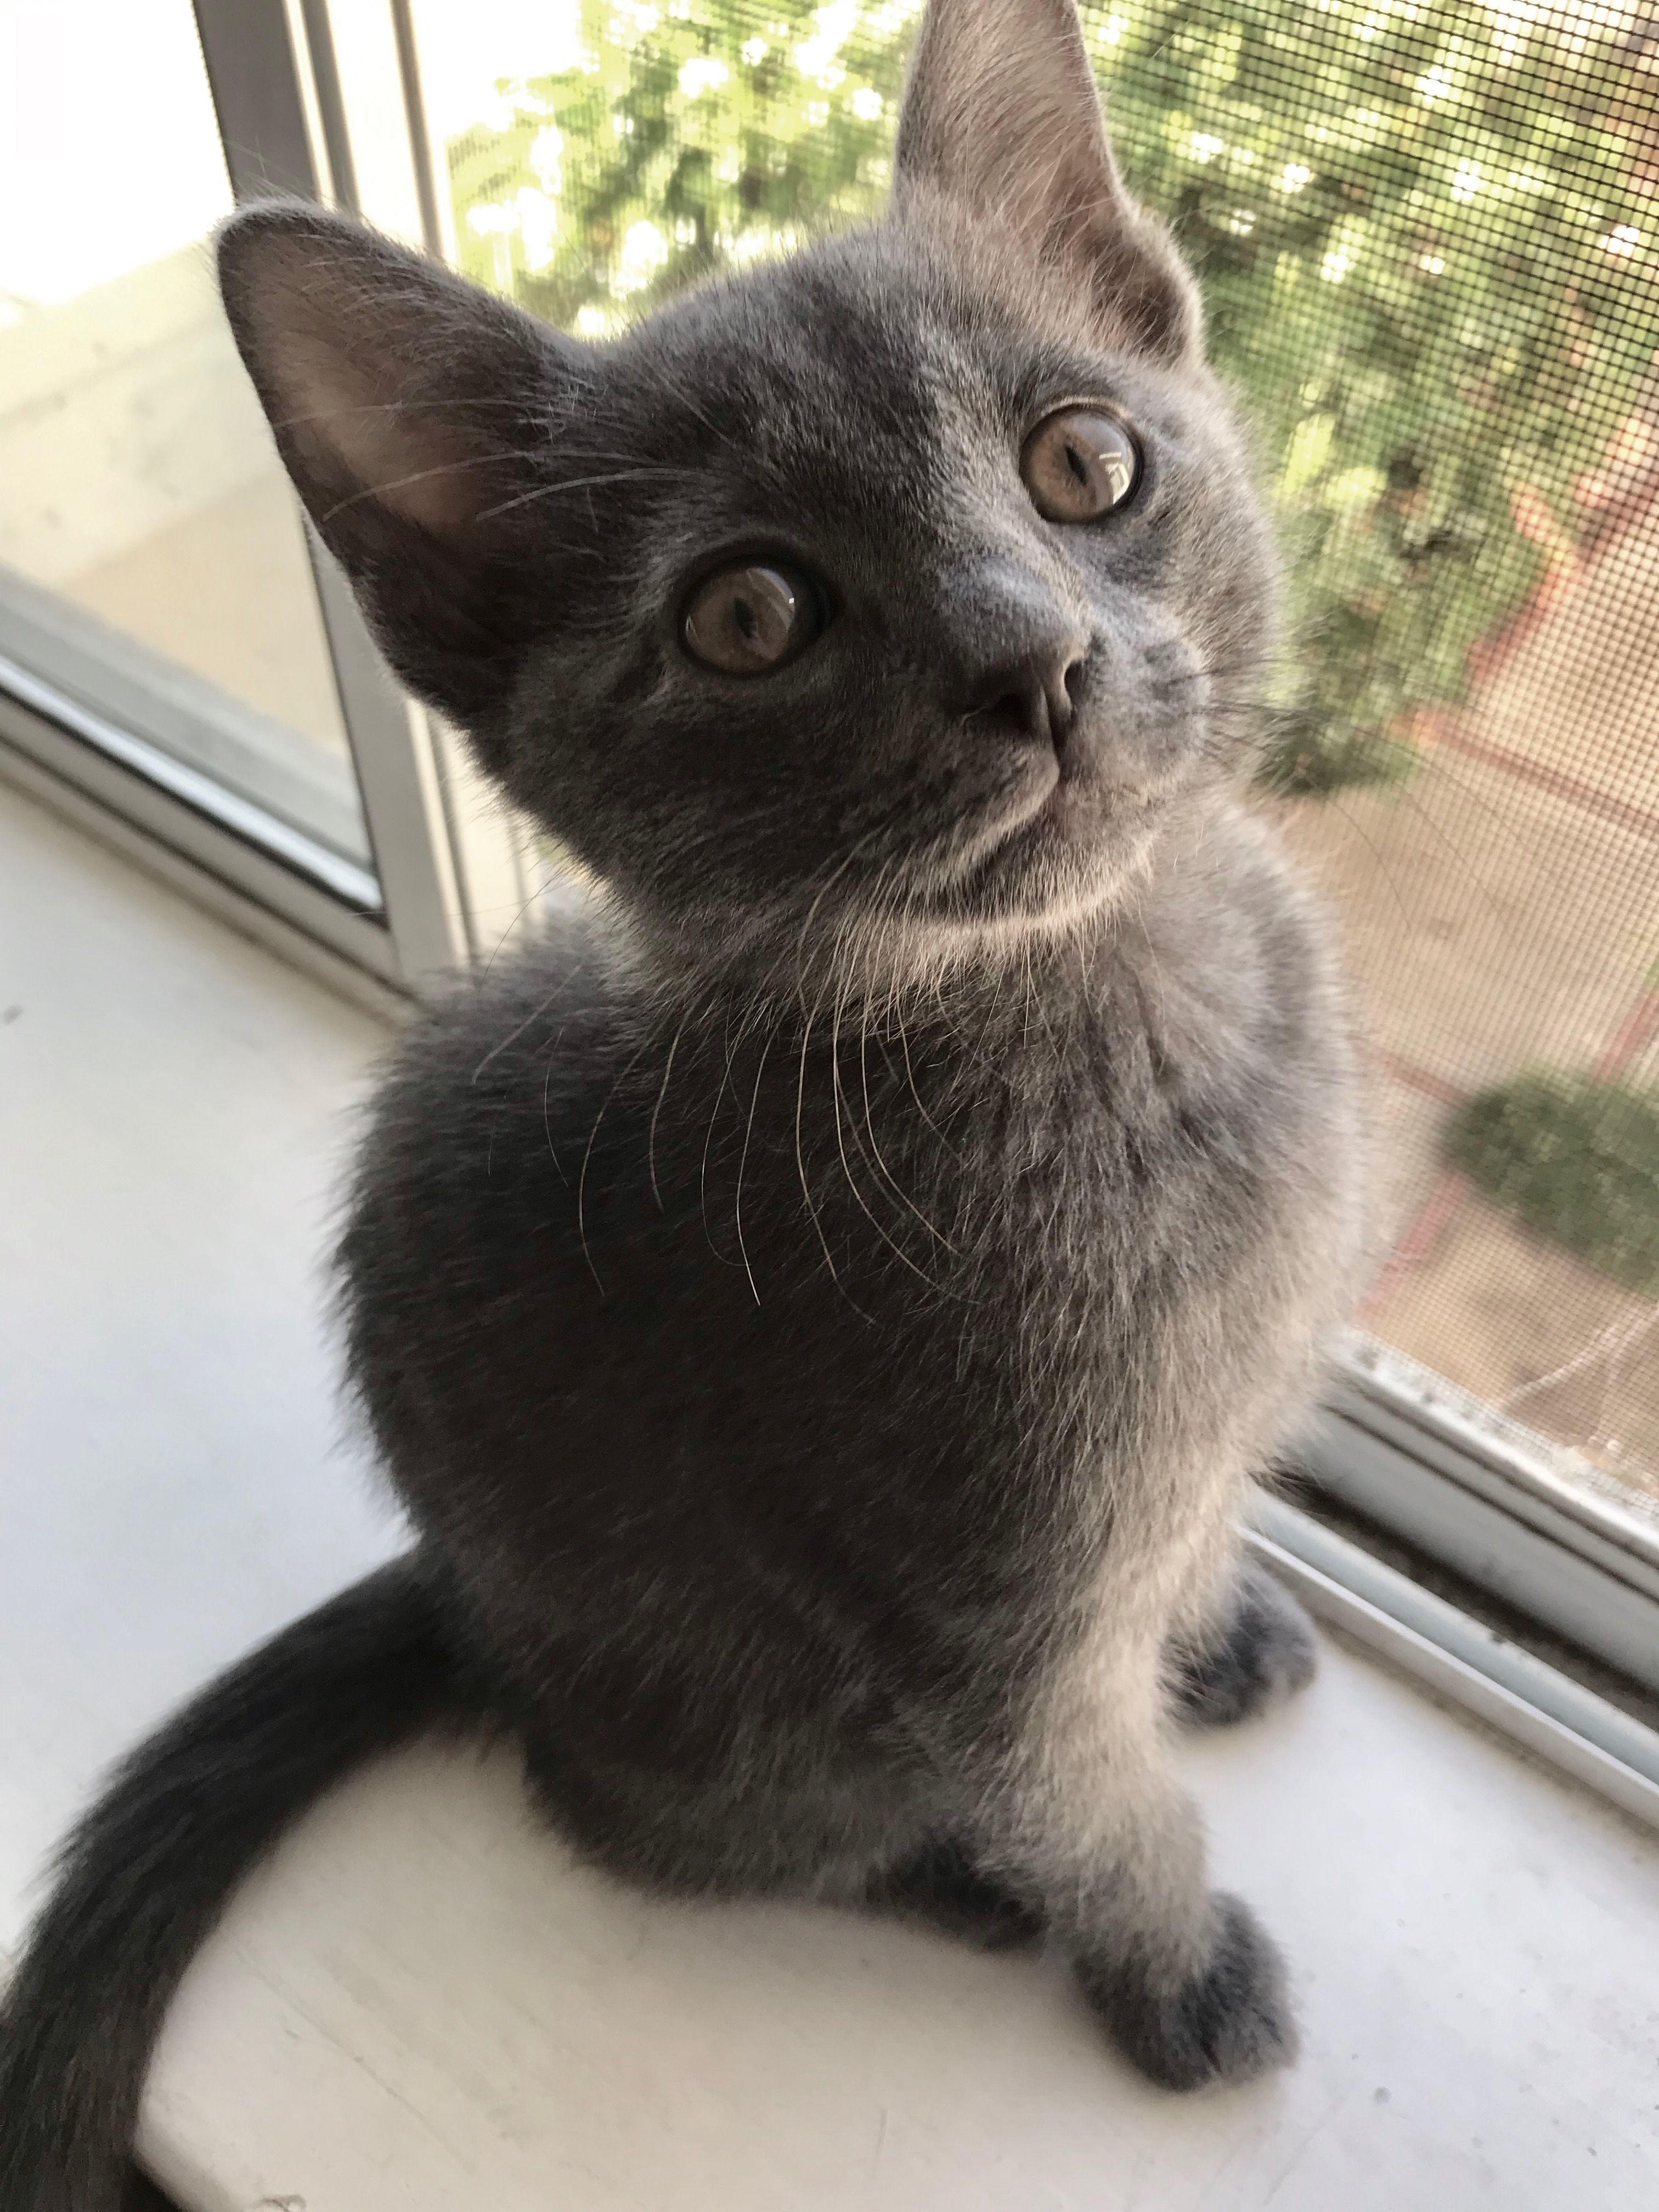 Fully Coated Black Roan Lykoi Kitten Podrick From Greymoonlykoi Lykoi Kitten Black Coat